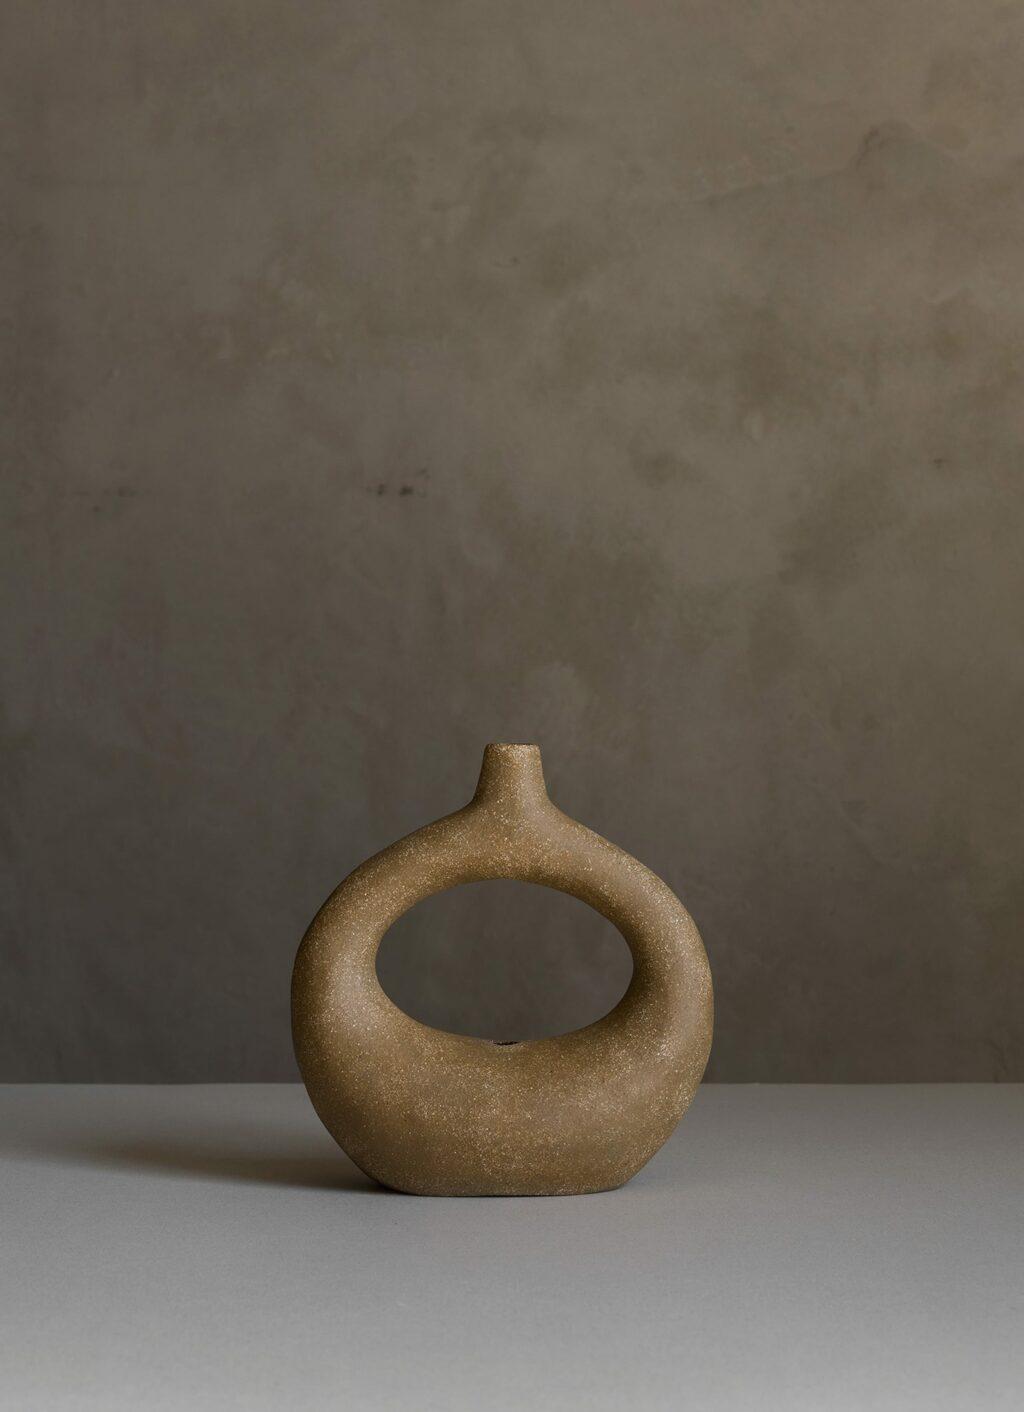 Viv Lee - Handmade stoneware vessel - Limited edition - Holo05 - medium buff